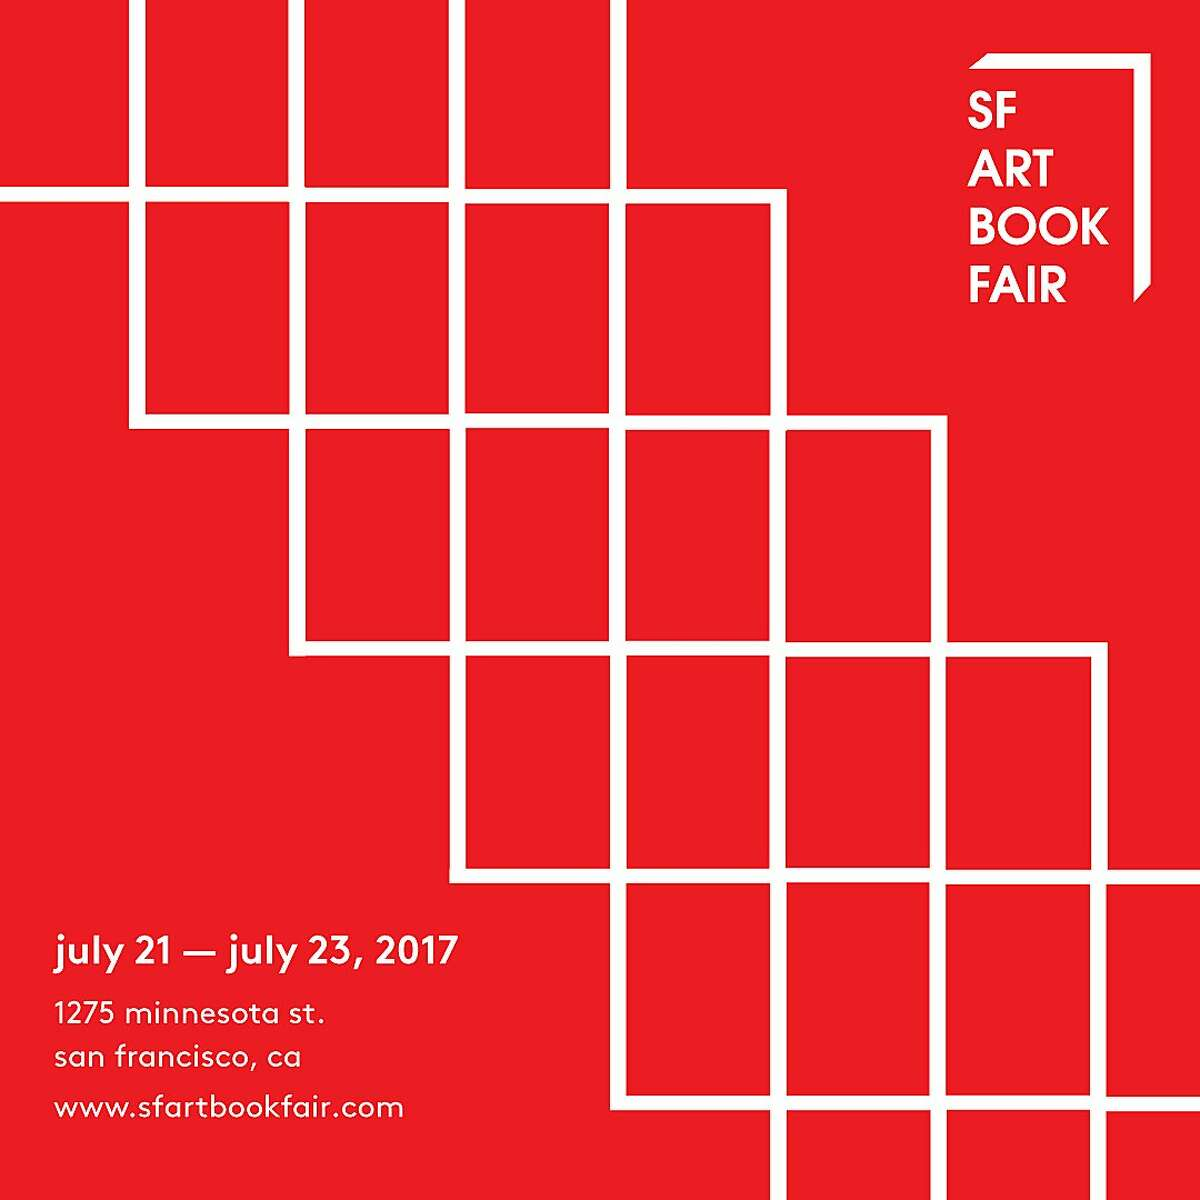 Promo material for second annual San Francisco Art Book Fair